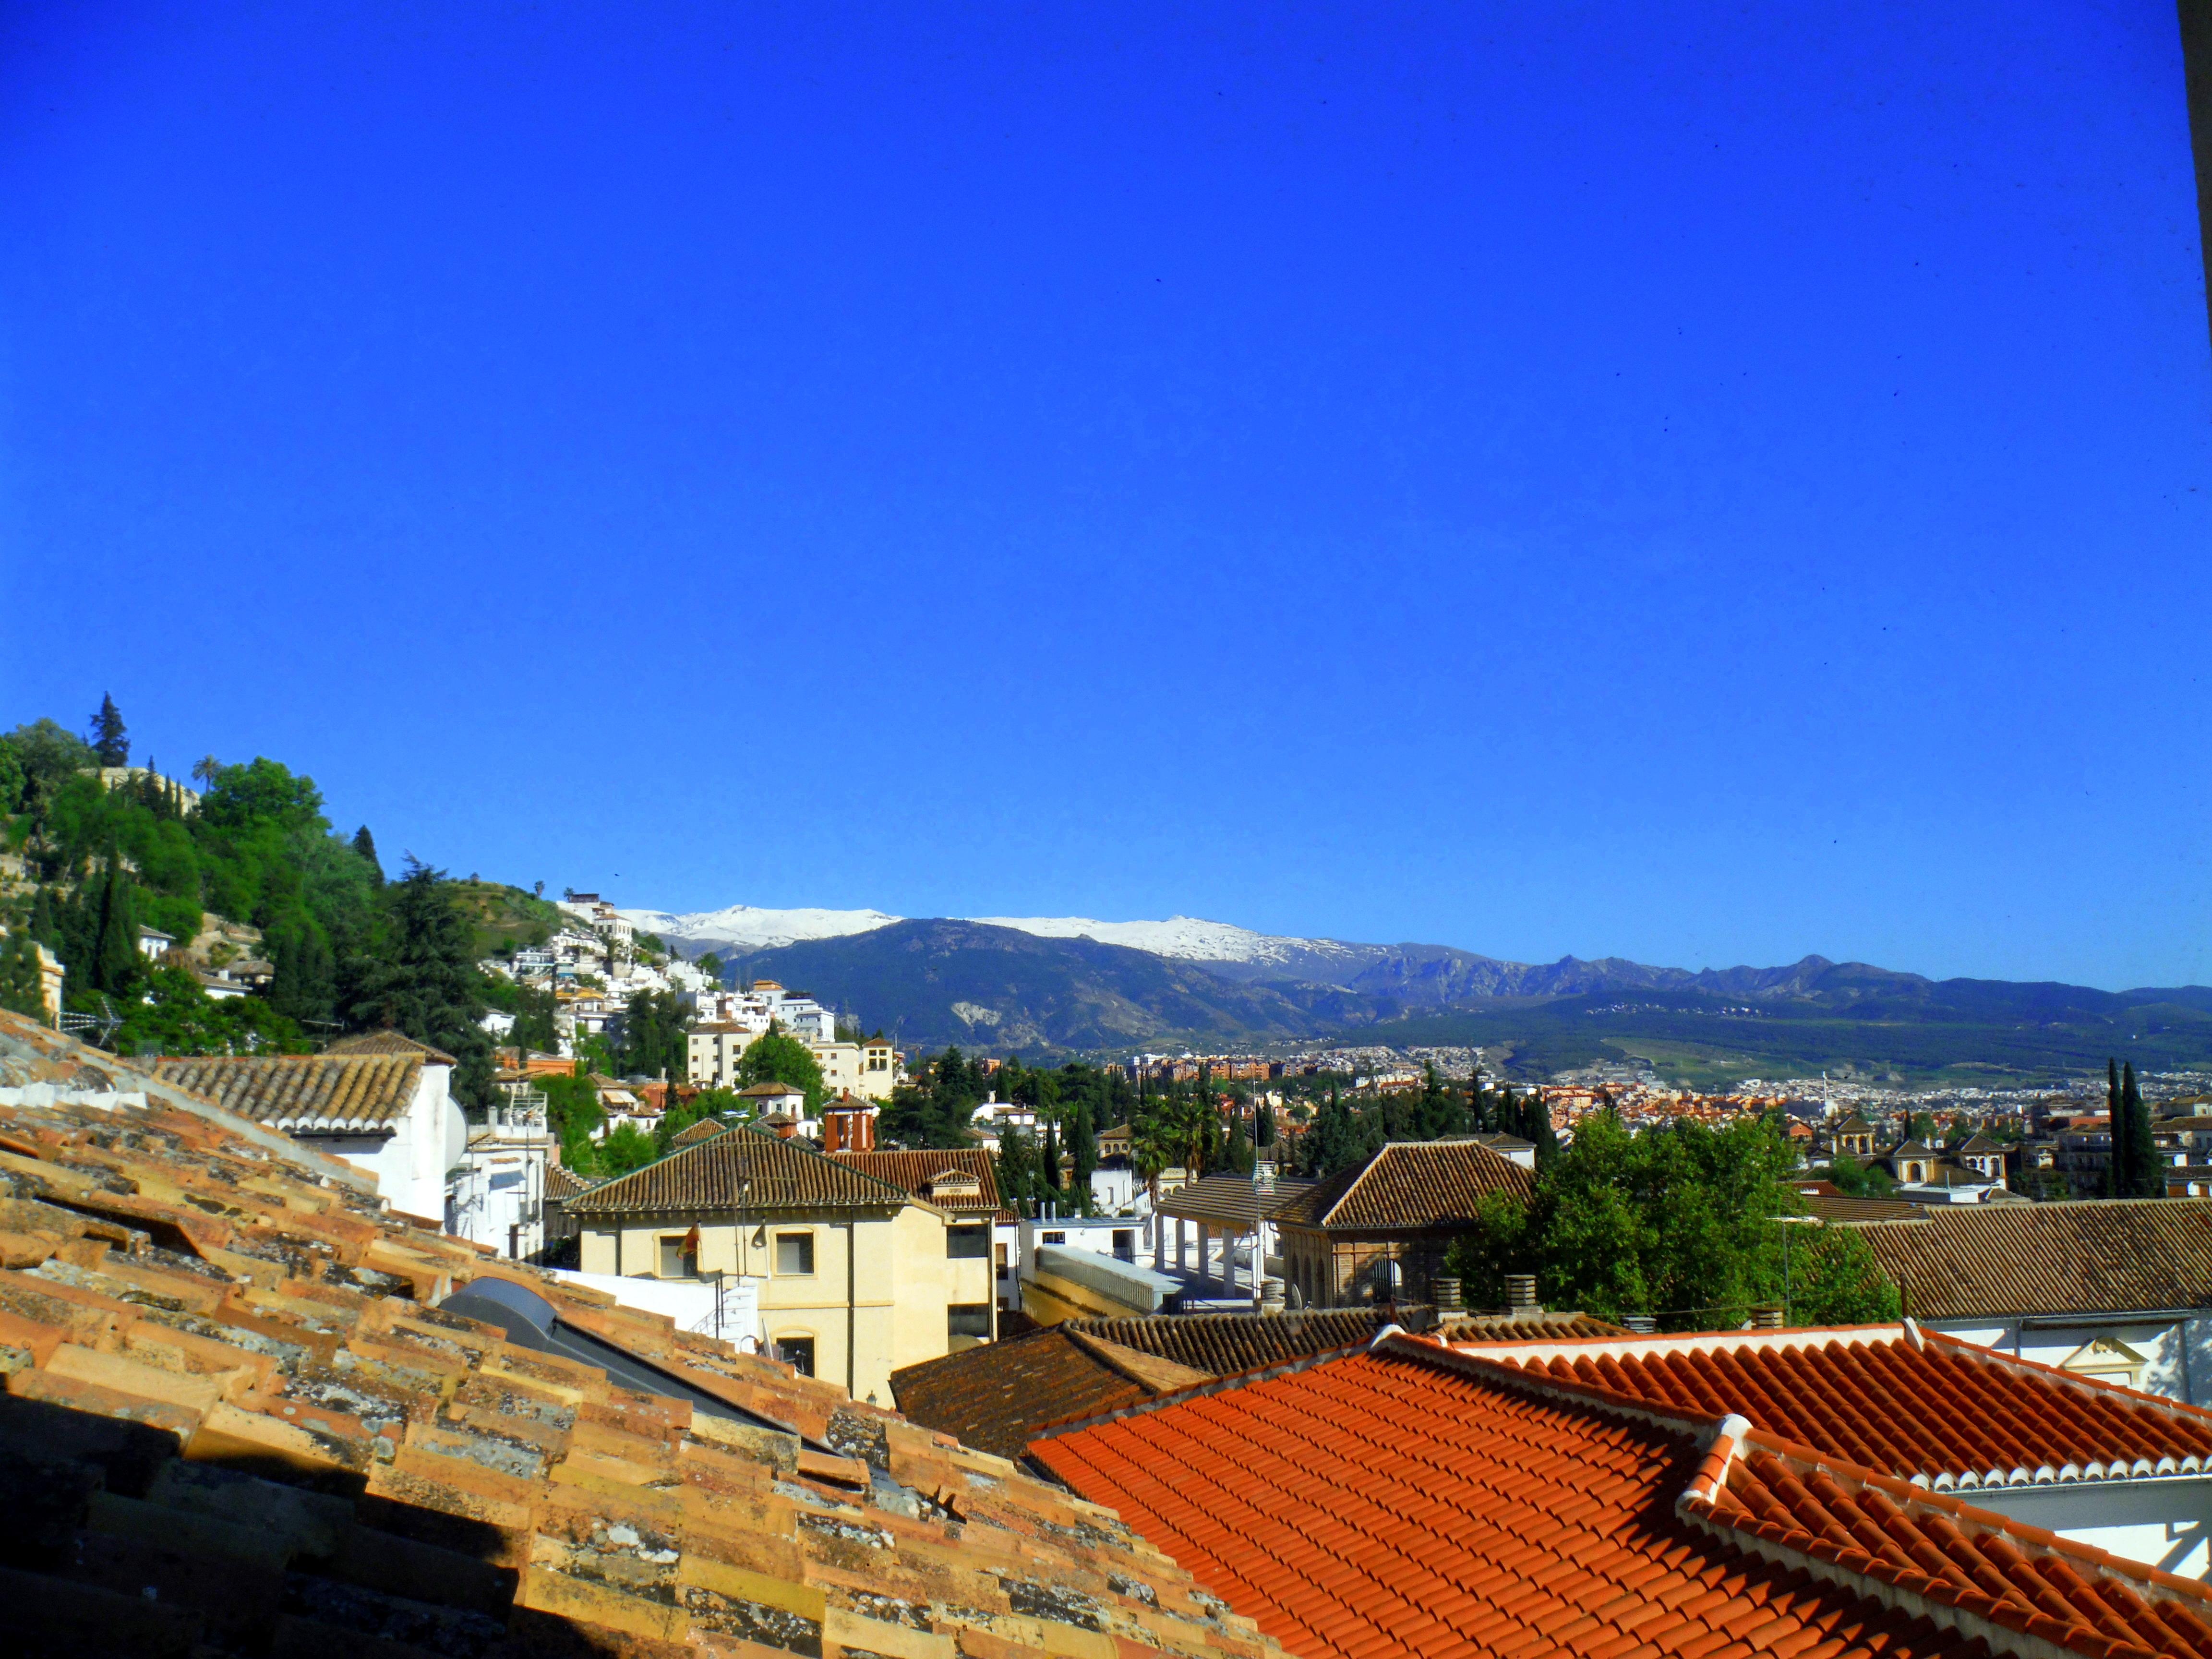 Las Golondrinas de La Alhambra, Granada